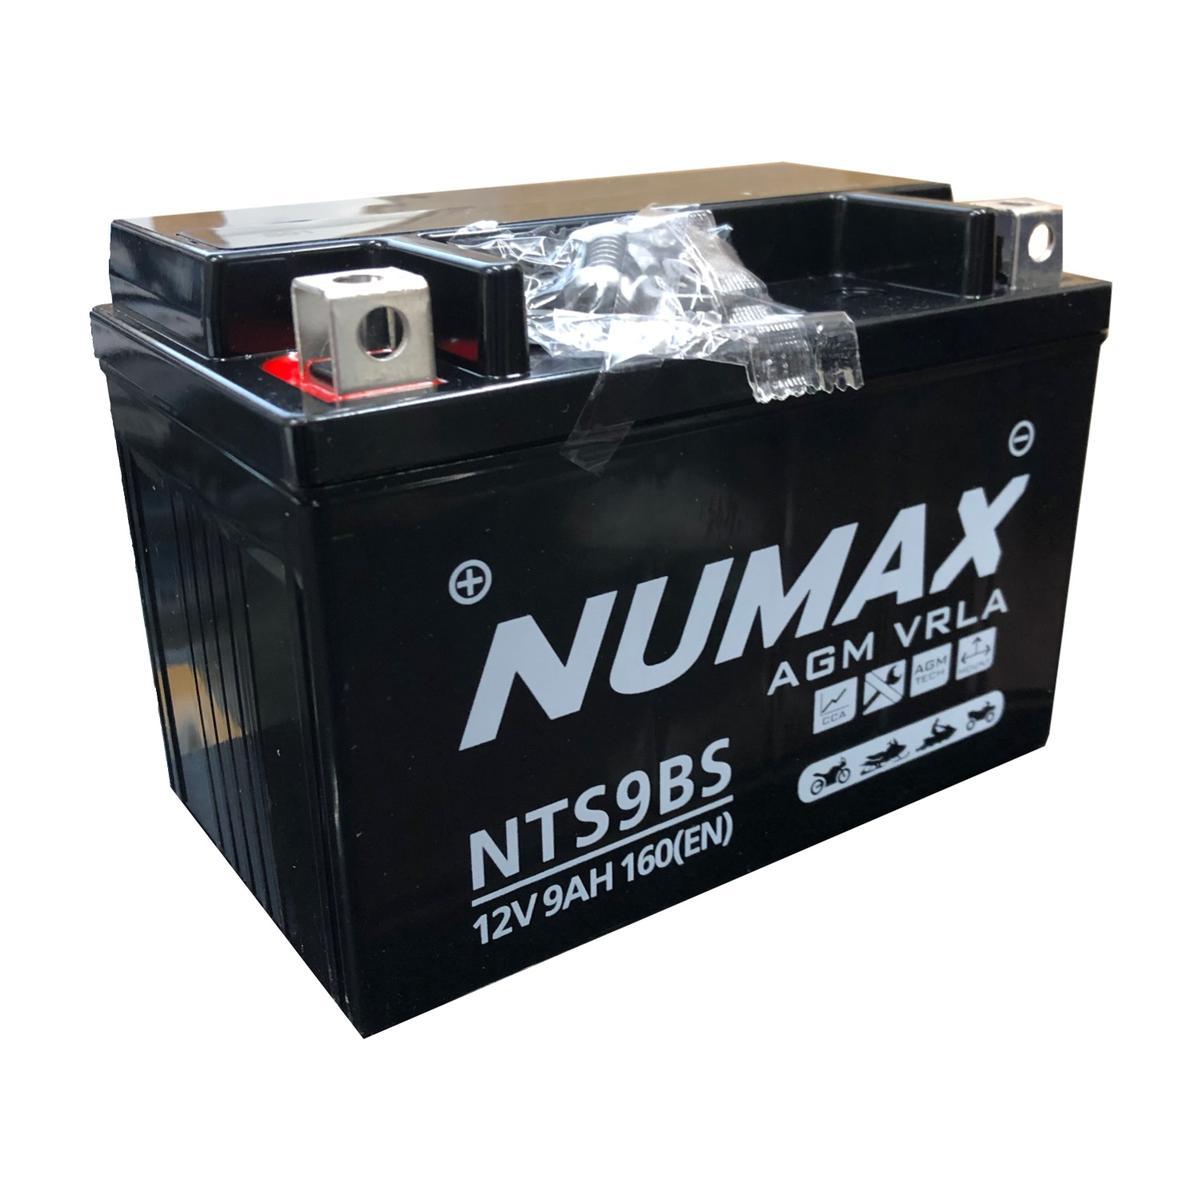 Numax NTS9BS 12v Motorbike Bike Gel Battery HONDA 650cc FX650 YXT9-4